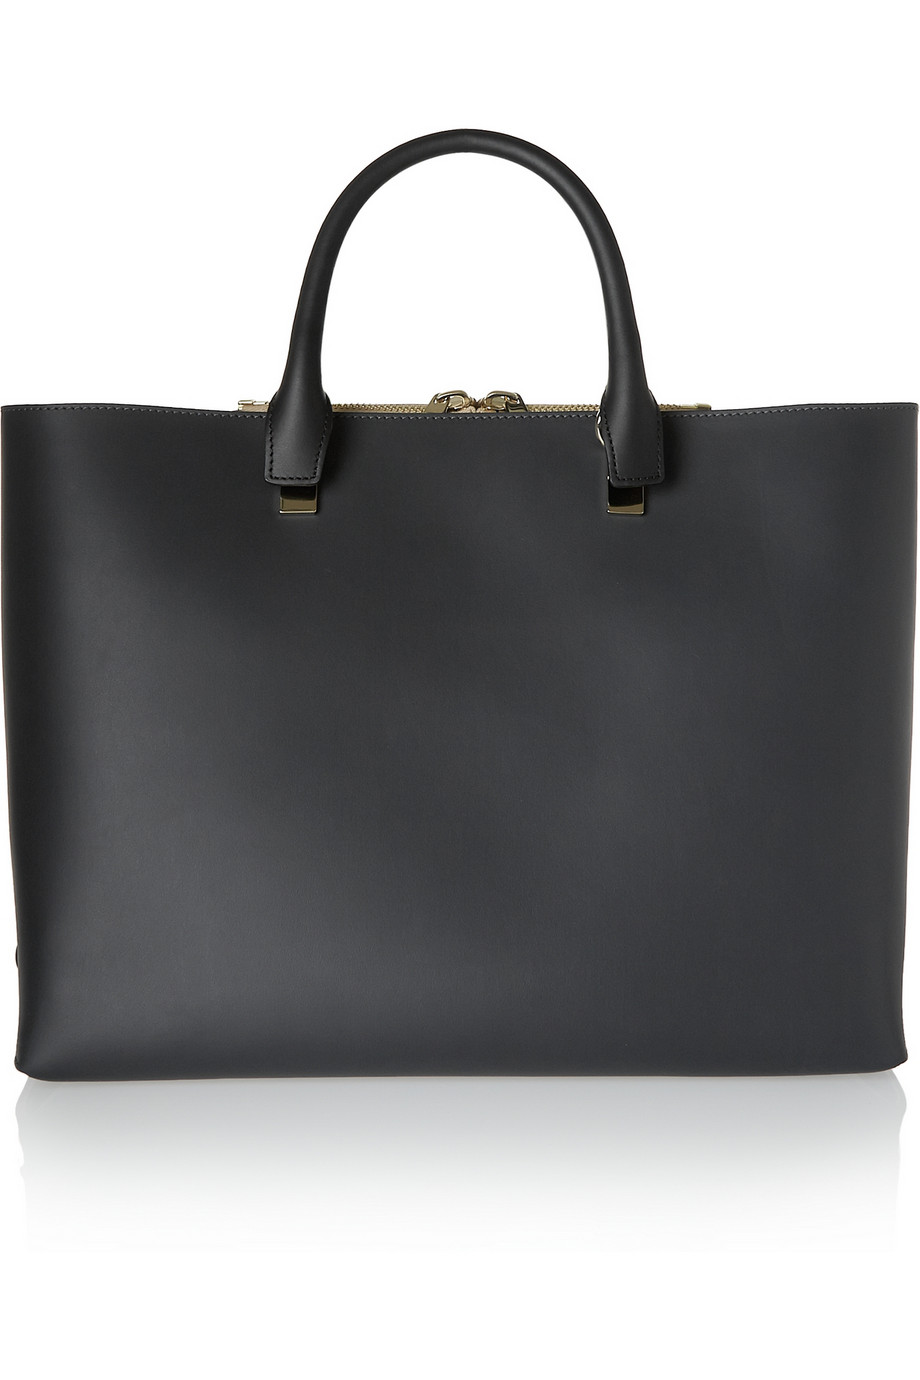 Baylee Medium two-tone leather – Chloé – 2015